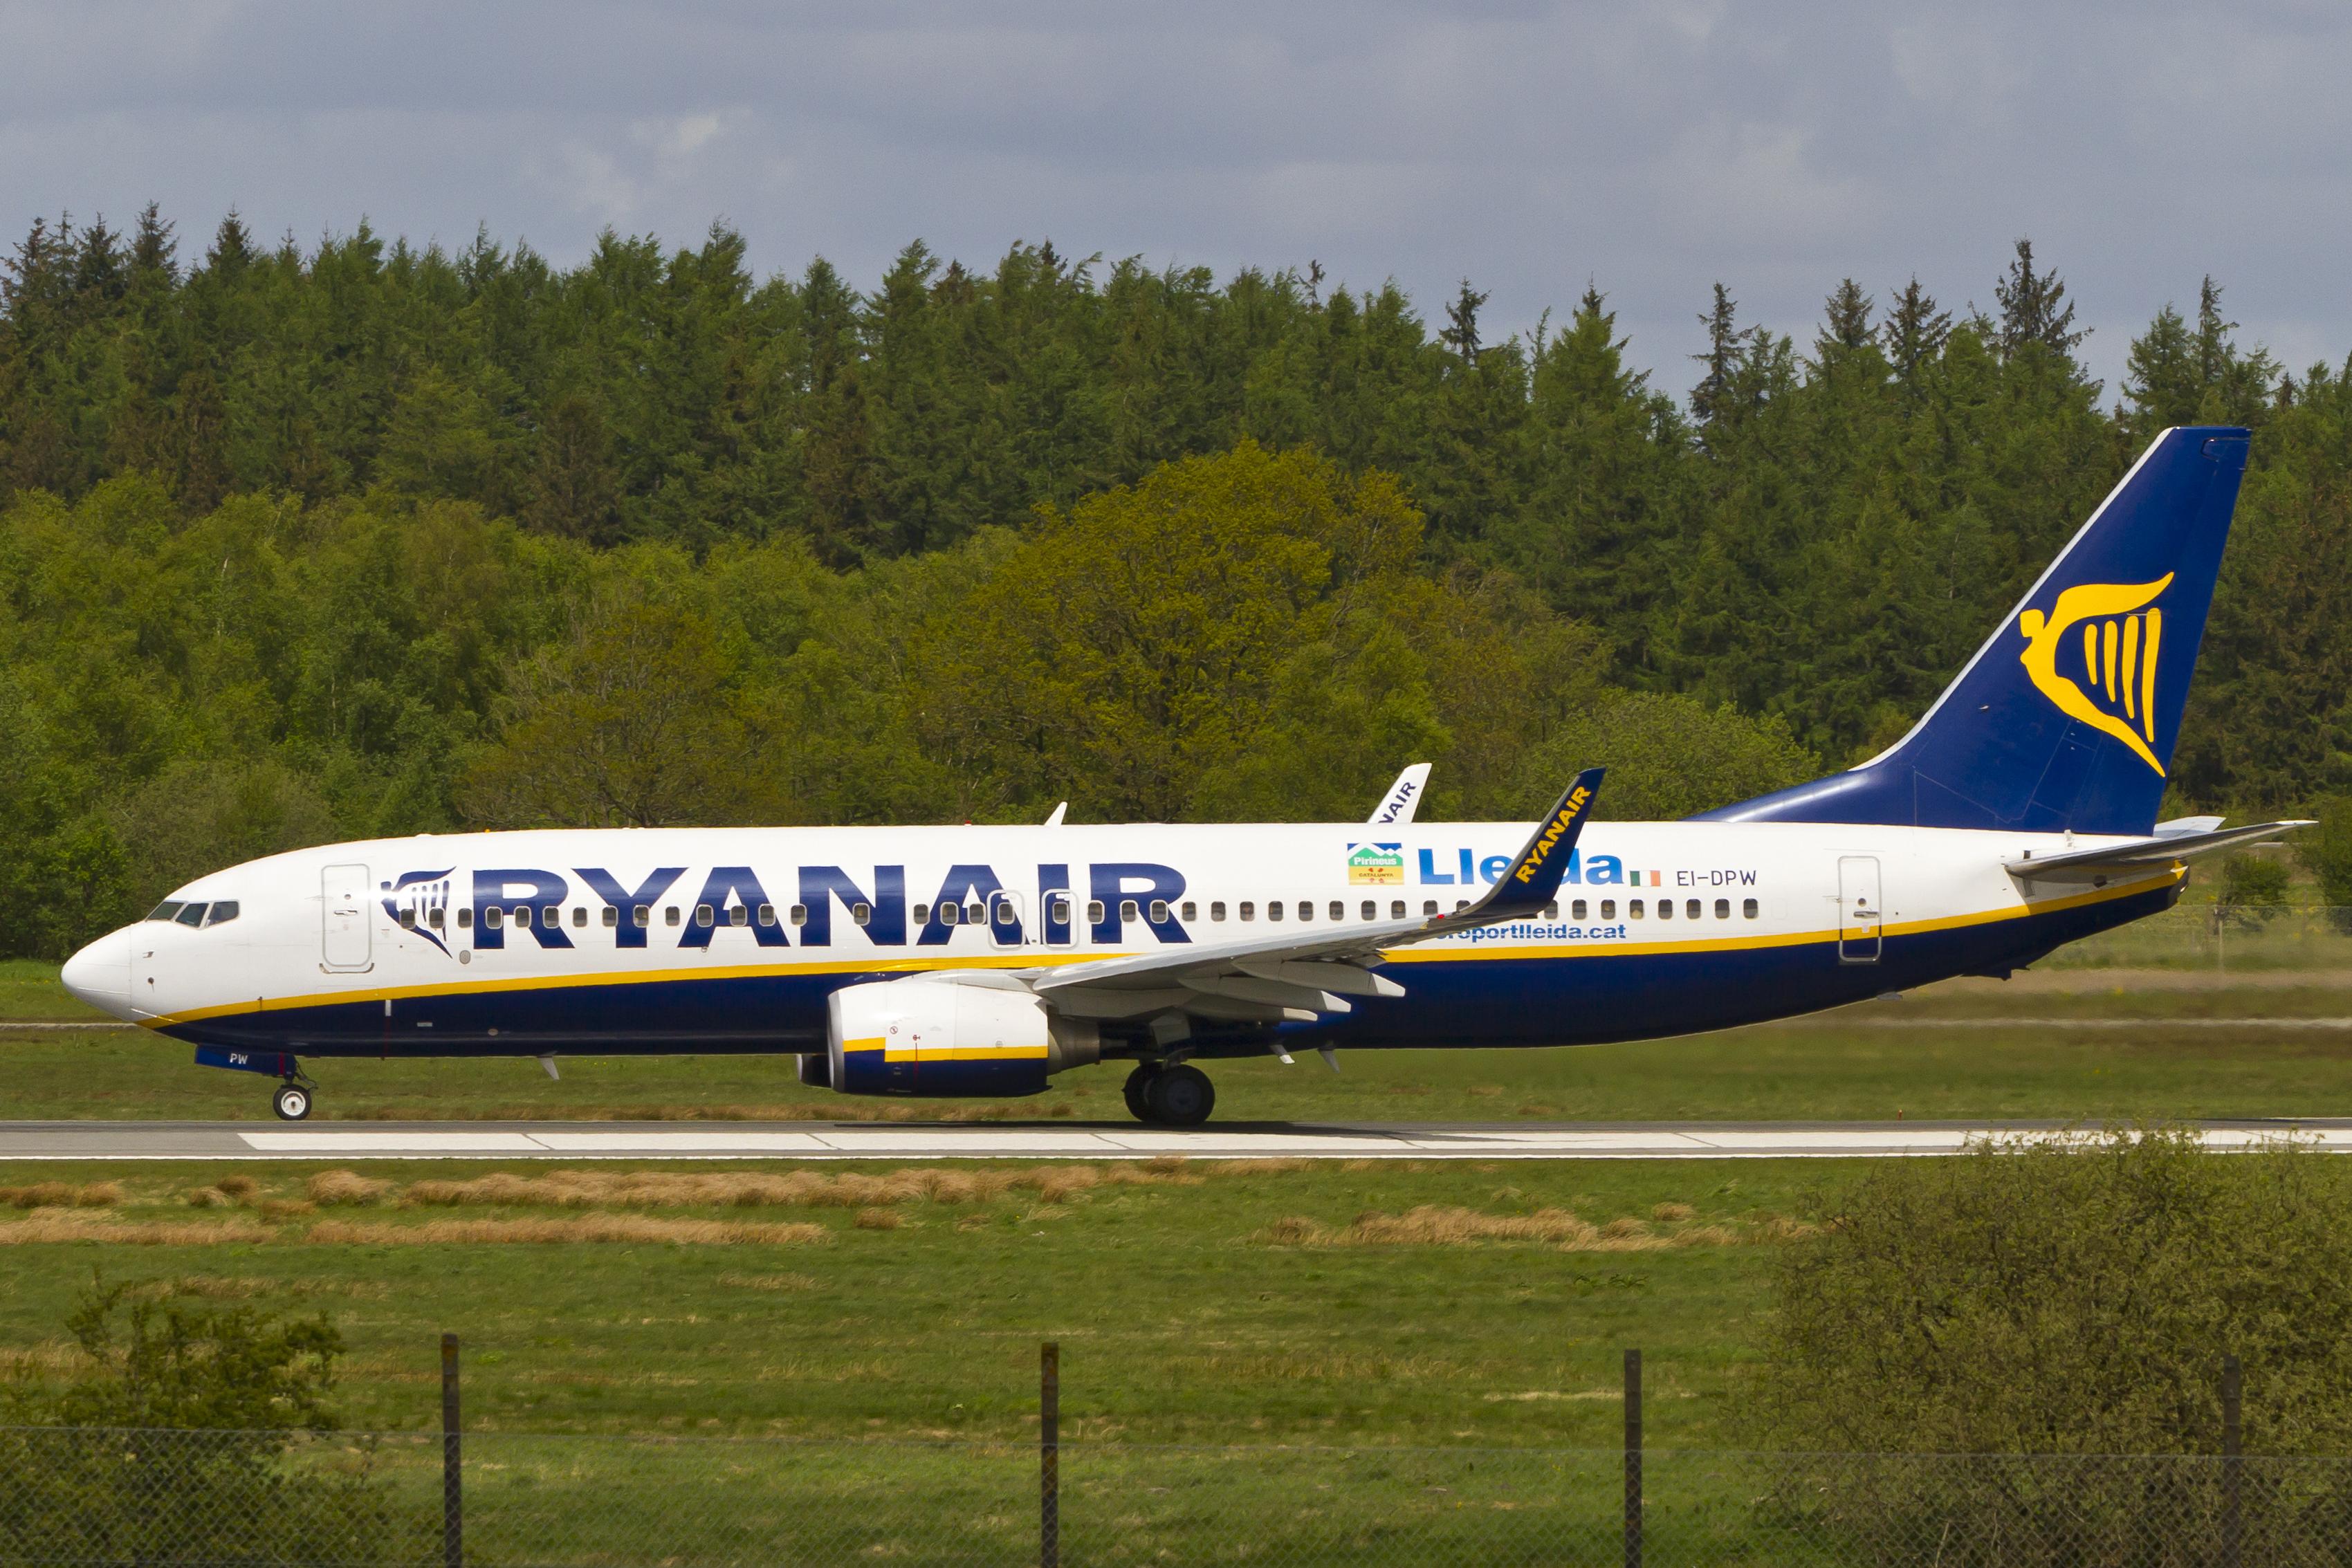 En Boeing 737-800 fra Ryanair – ikke den nyeste. Foto: © Thorbjørn Brunander Sund, Danish Aviation Photo